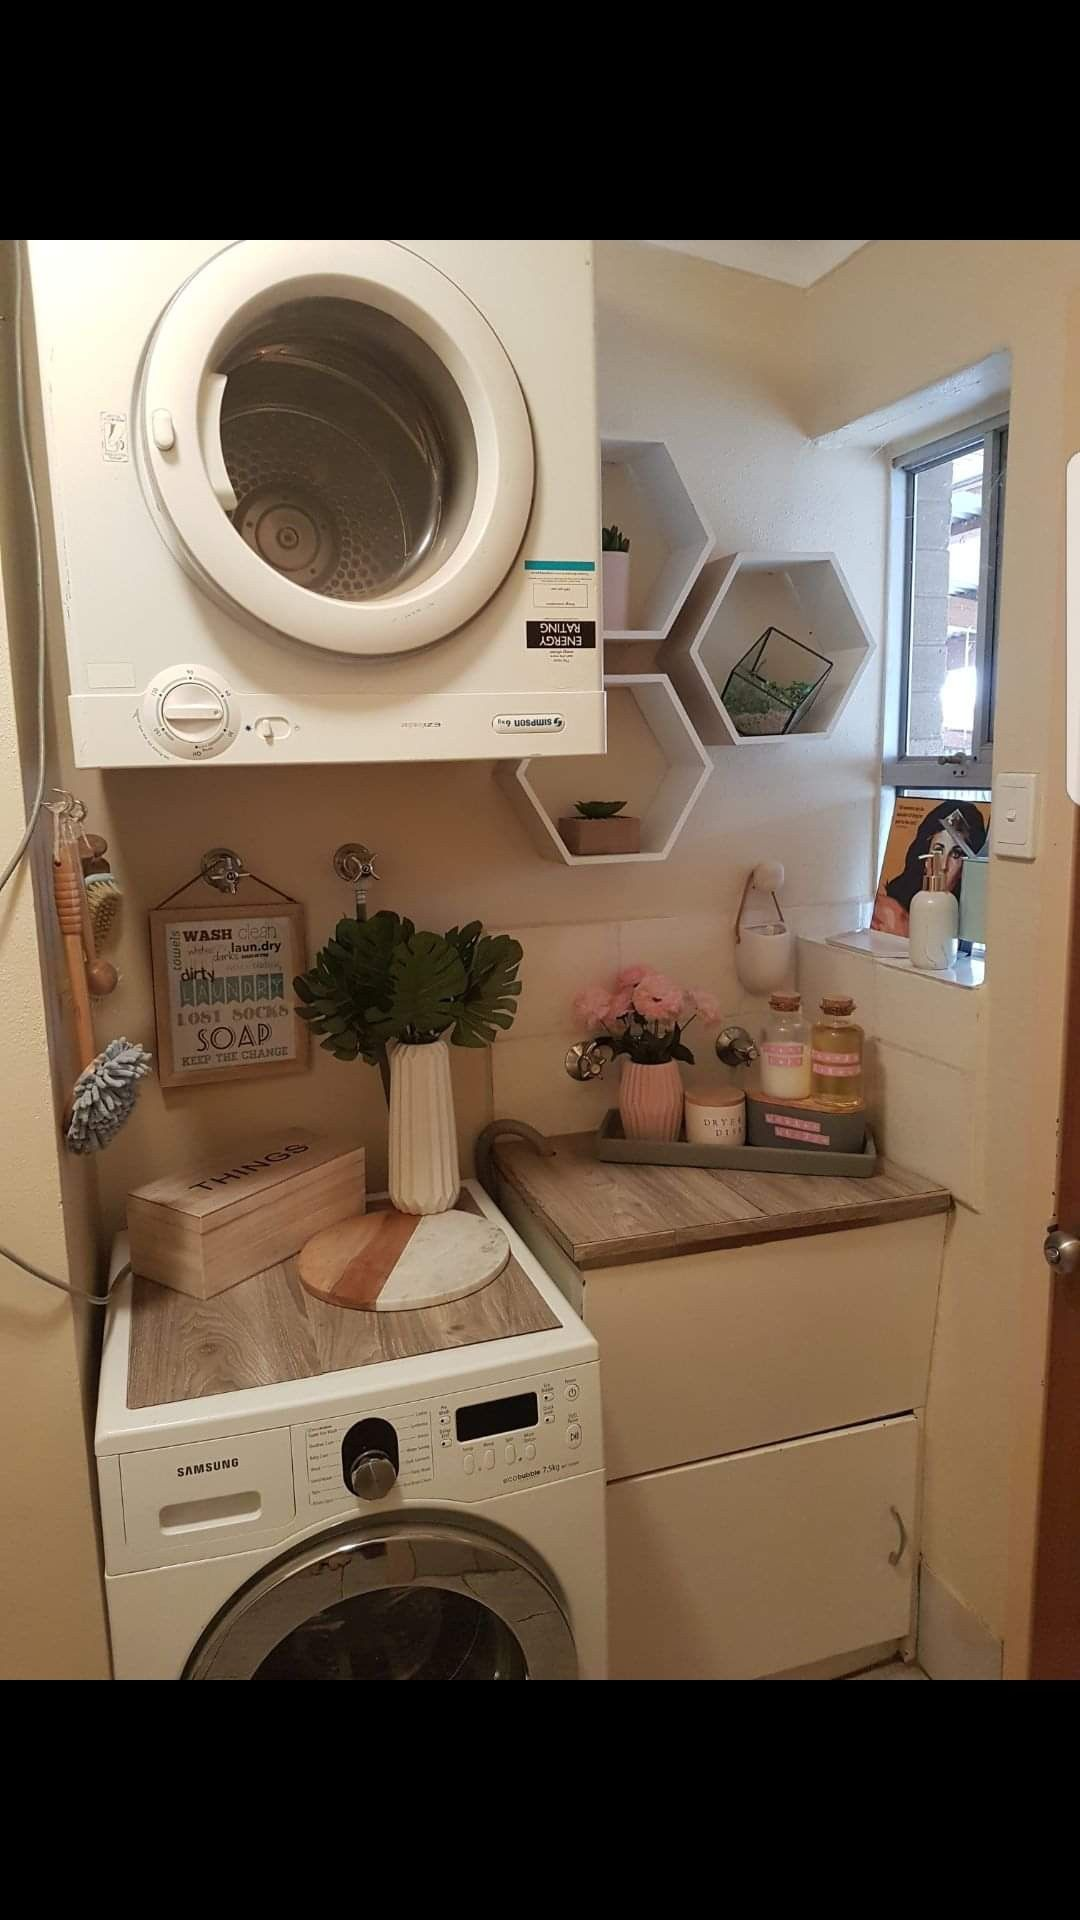 Pin By Sharney Horgan On Kmart Home Laundry Decor Kmart Decor